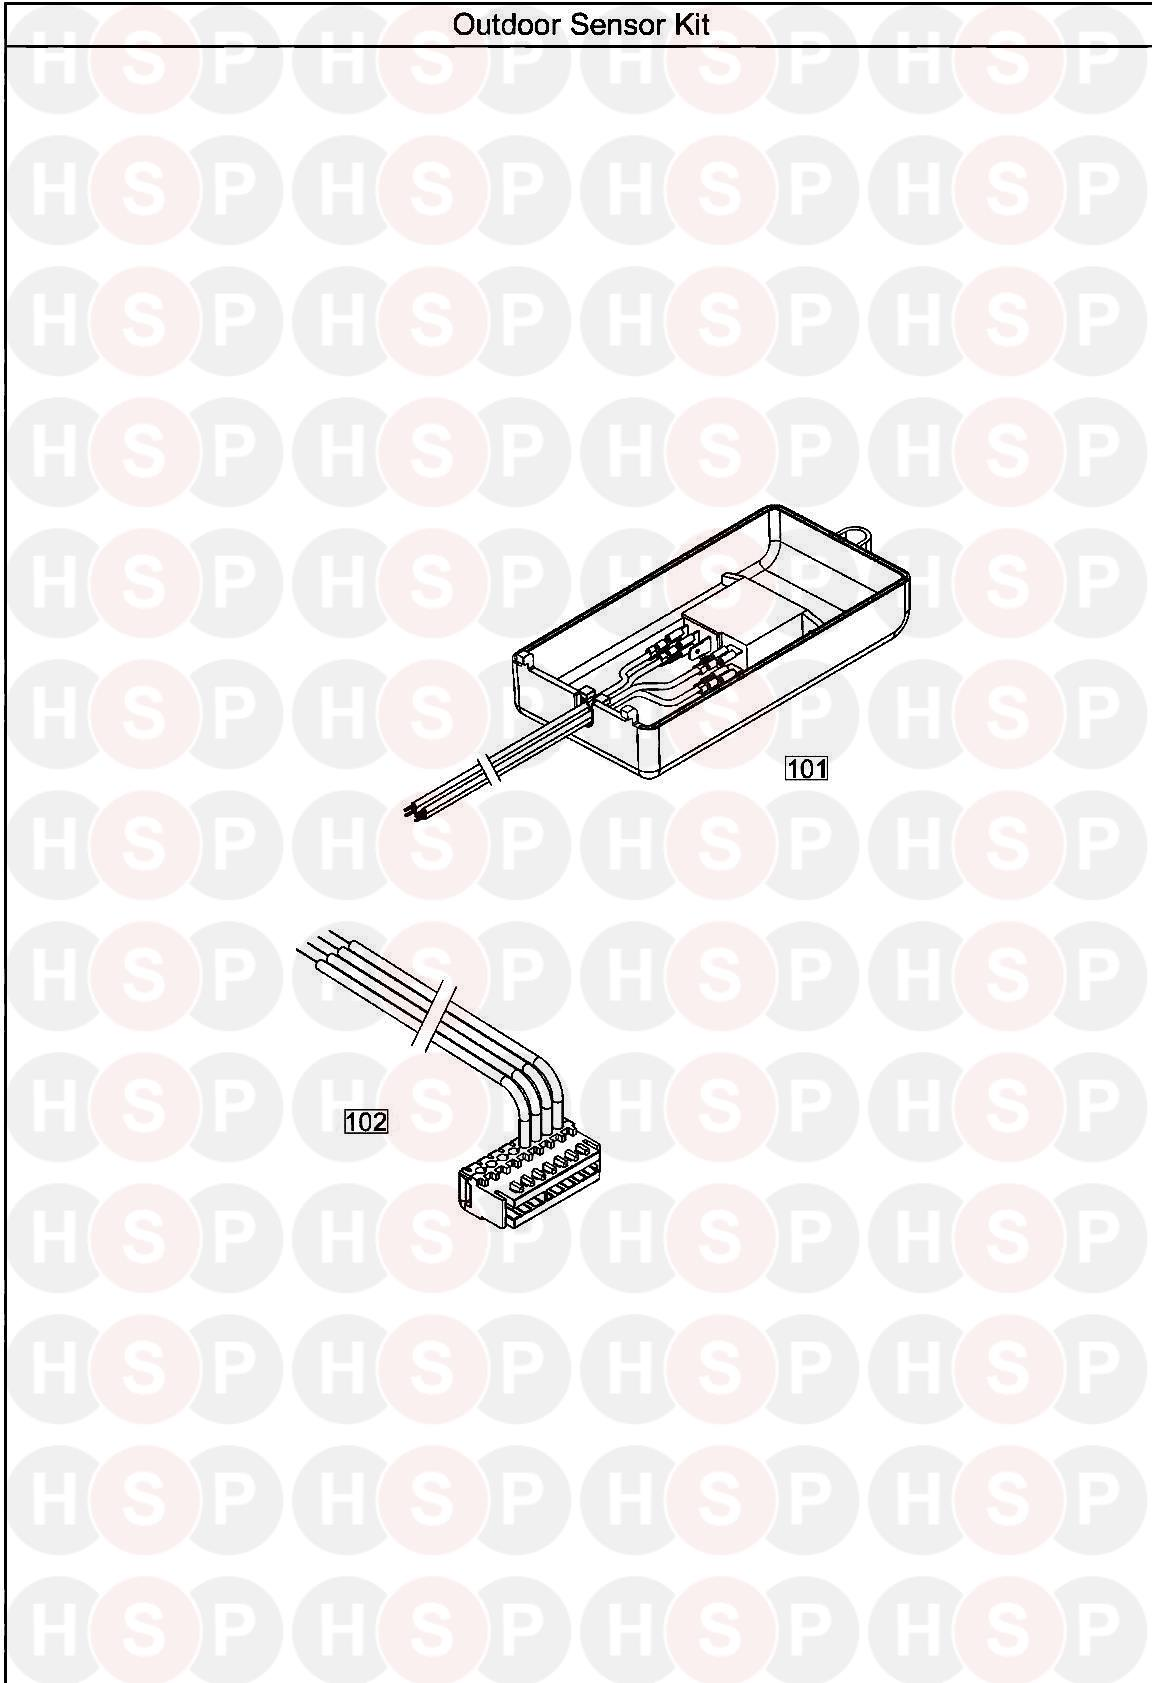 Baxi megaflo wiring diagram the best wiring diagram 2017 baxi megaflo 2 system 12 pact ga outdoor sensor diagram asfbconference2016 Choice Image